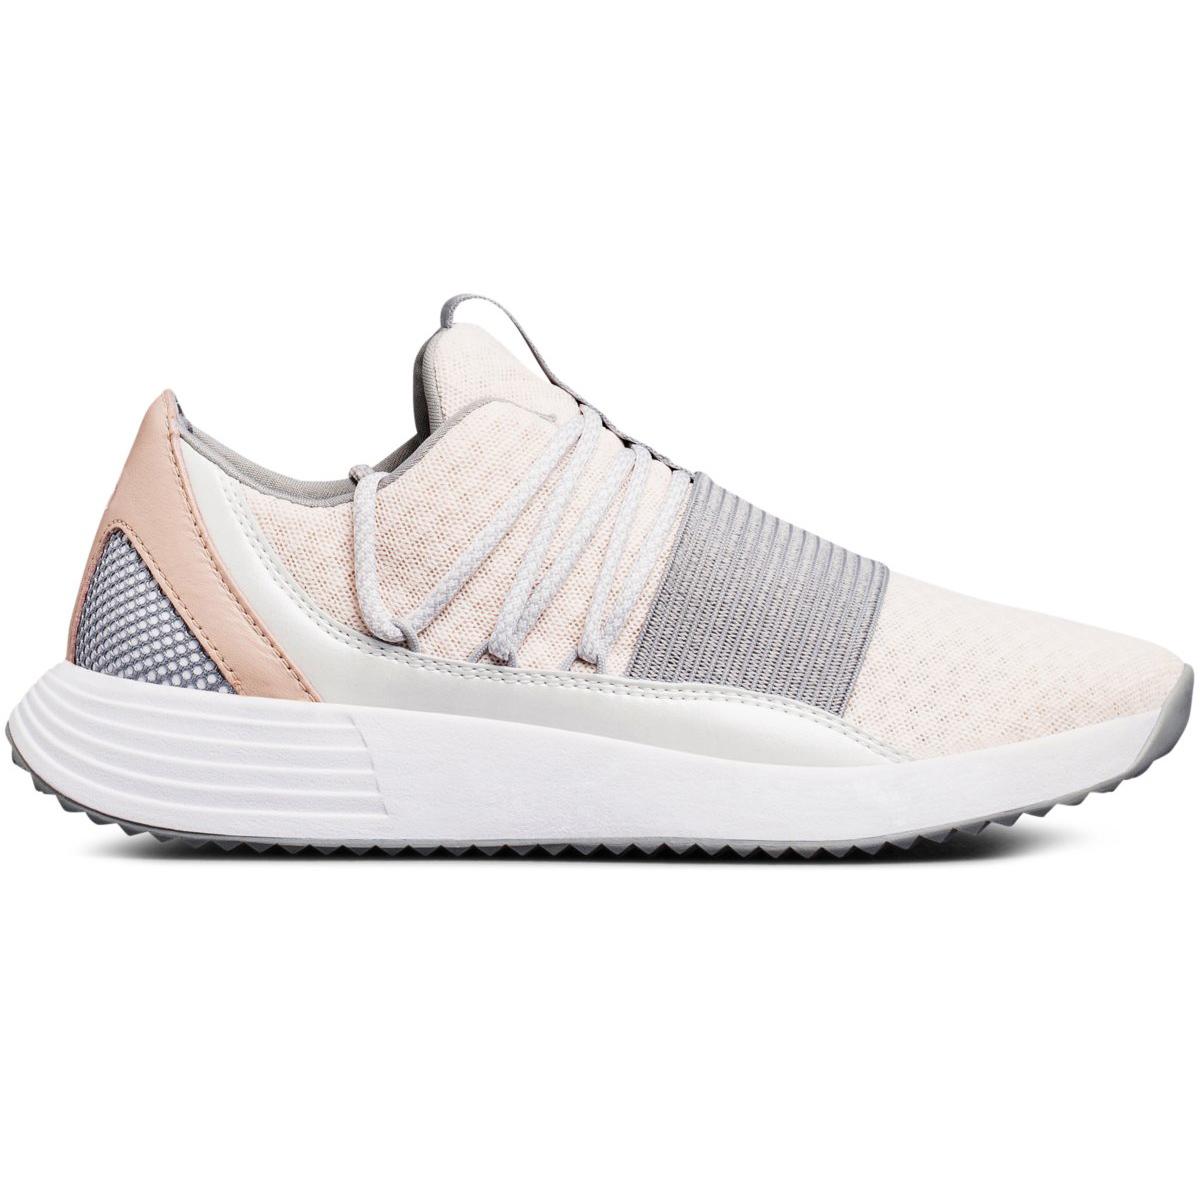 UA Breathe Lace Cross-Training Shoes